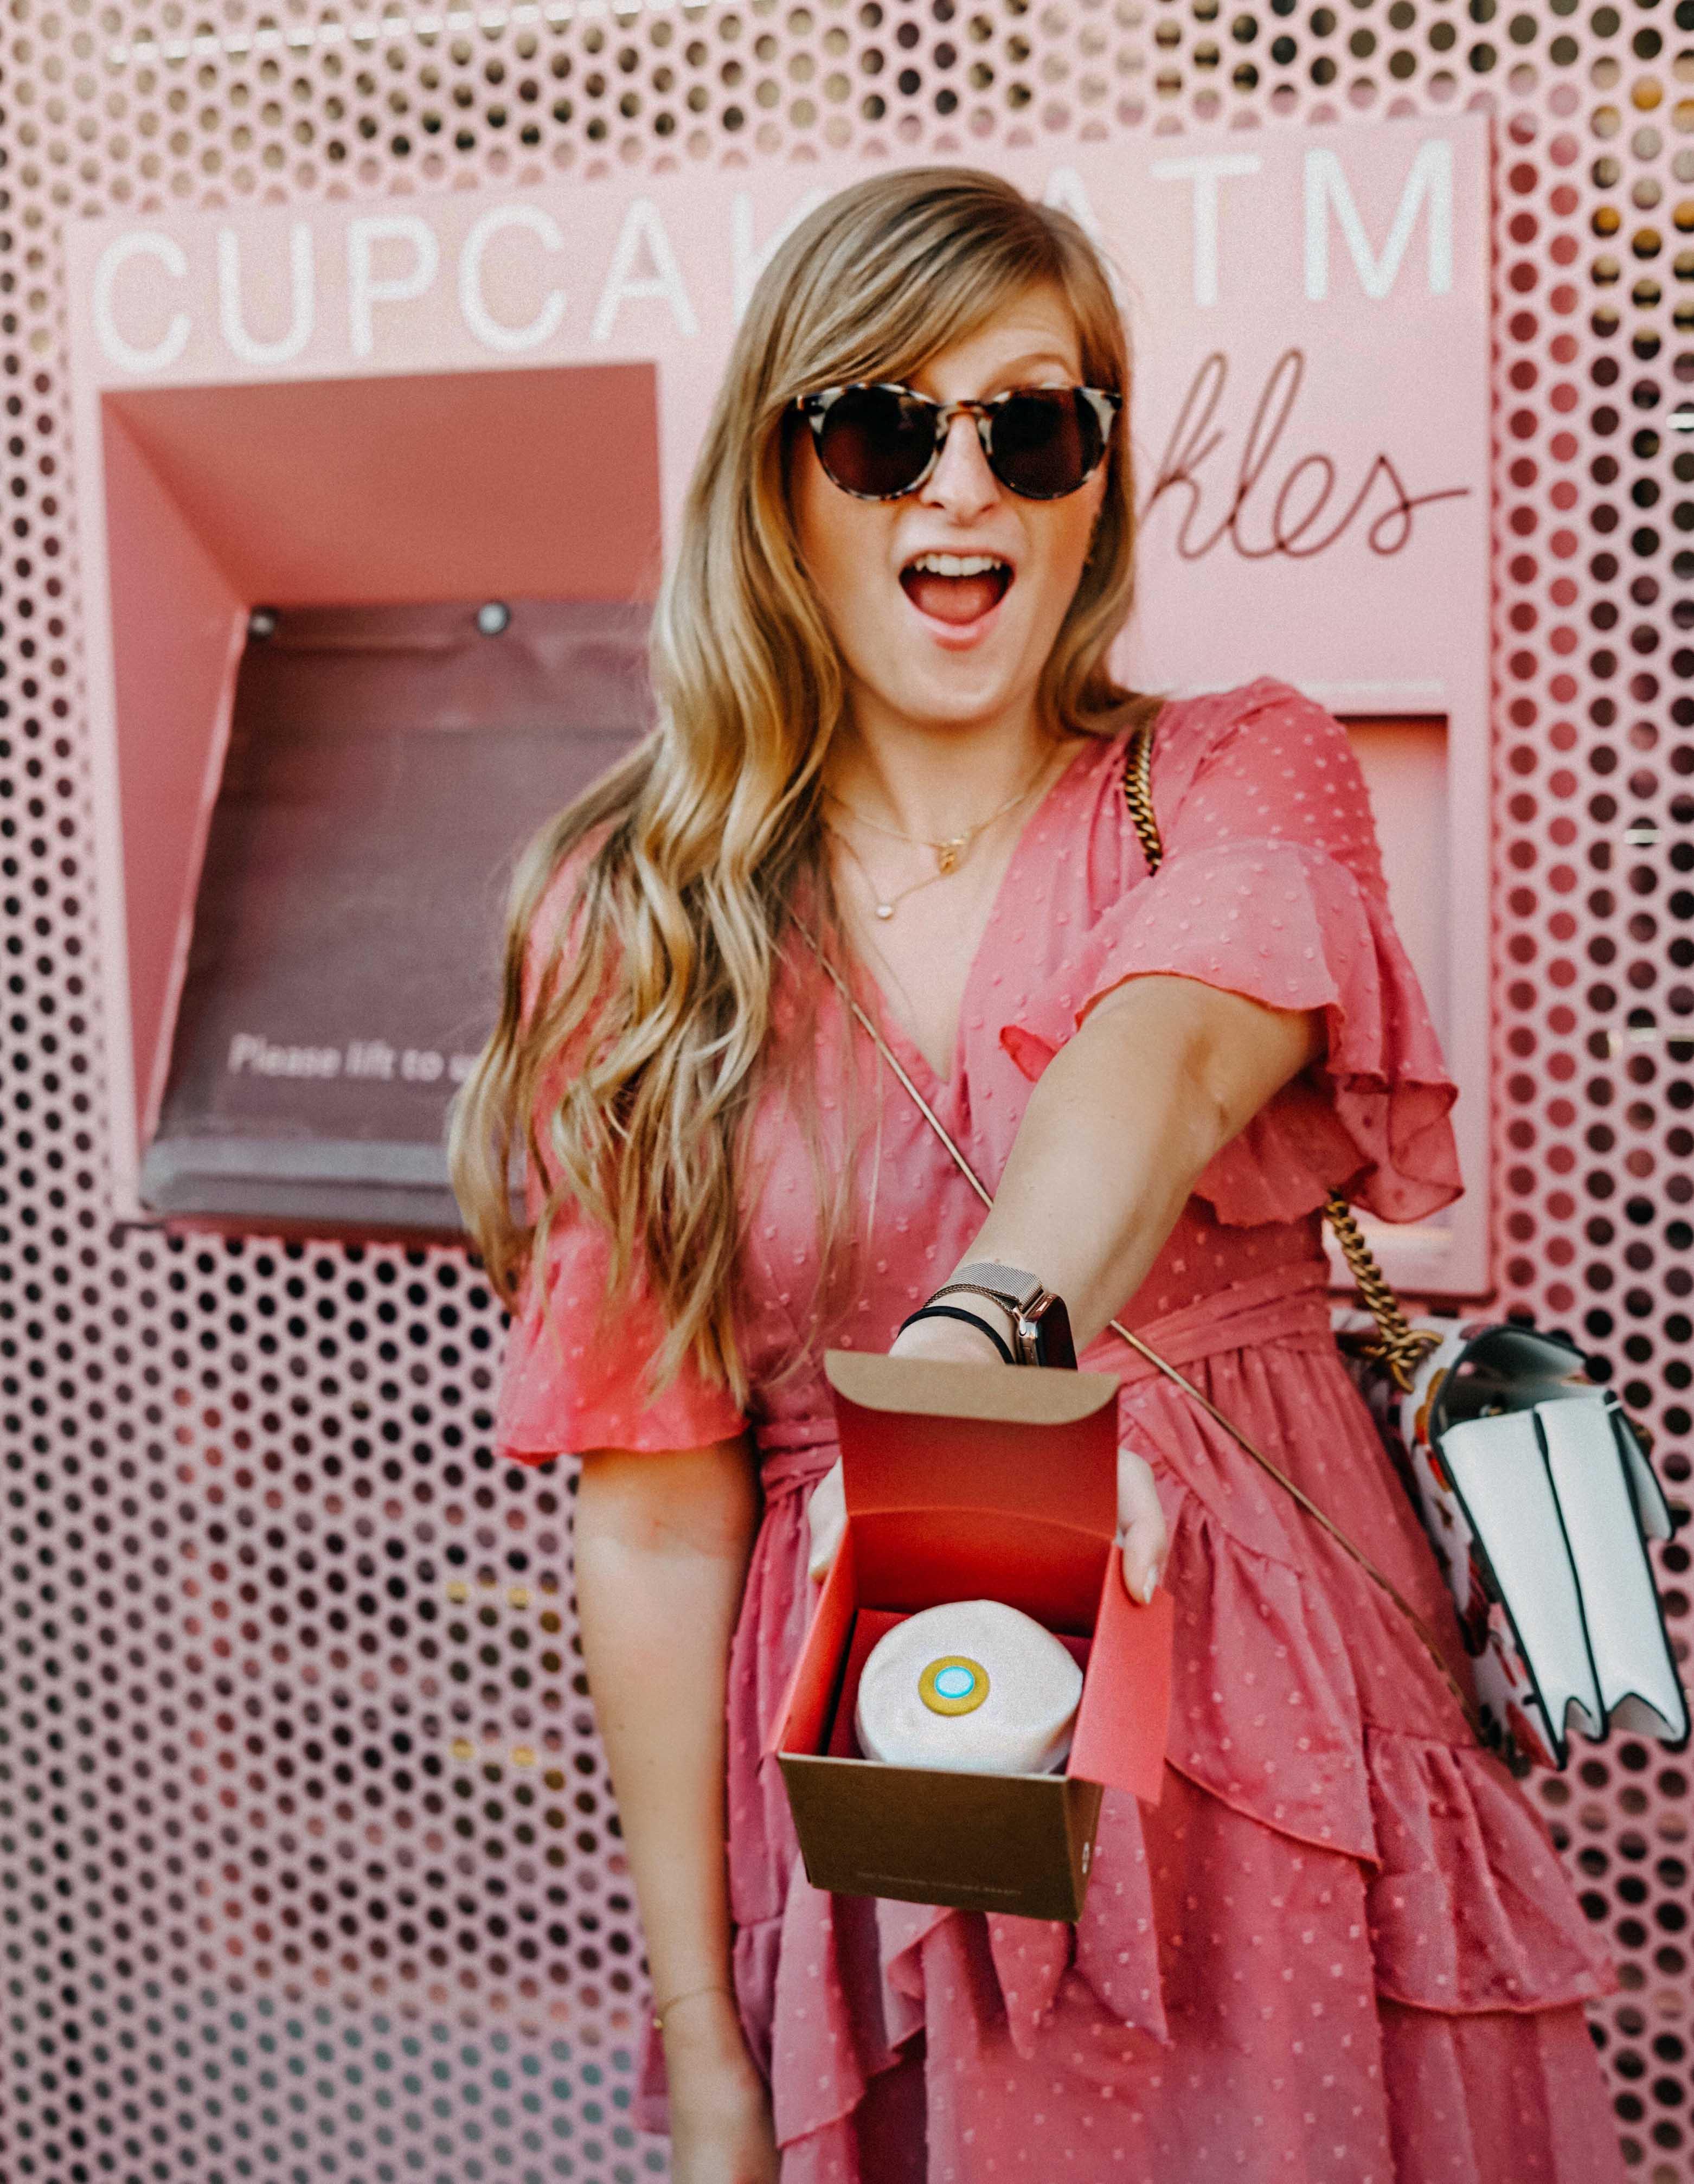 Top Insider Tipps Los Angeles Cupcake Automat pink Sprinkles Cupcake ATM Instagram Spot LA Reiseblog